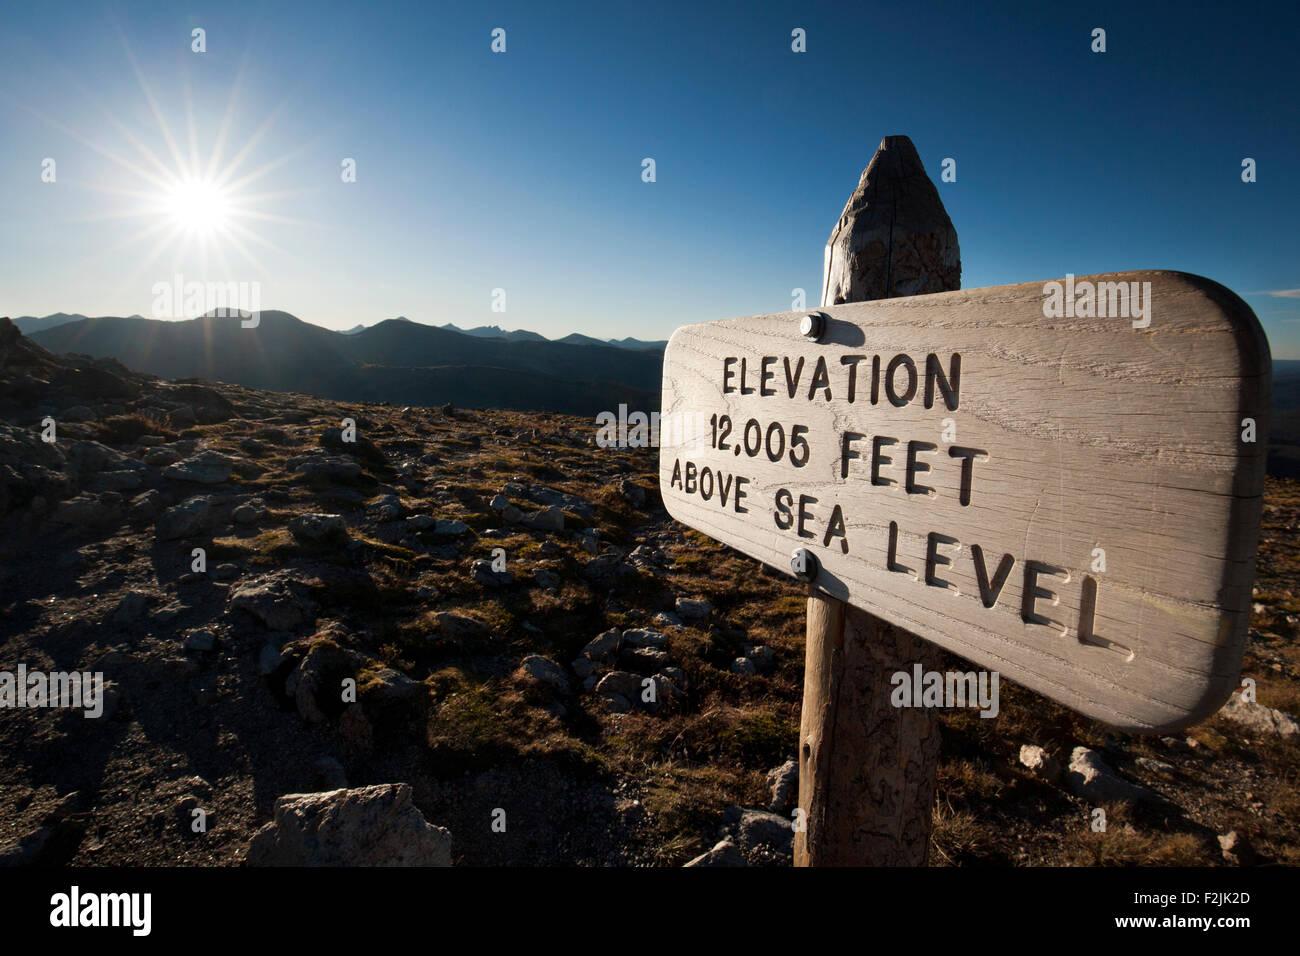 Elevation Sign 12,005 Feet - Alpine Tundra Ecosystem - Rocky Mountain National Park, near Estes Park, Colorado, - Stock Image